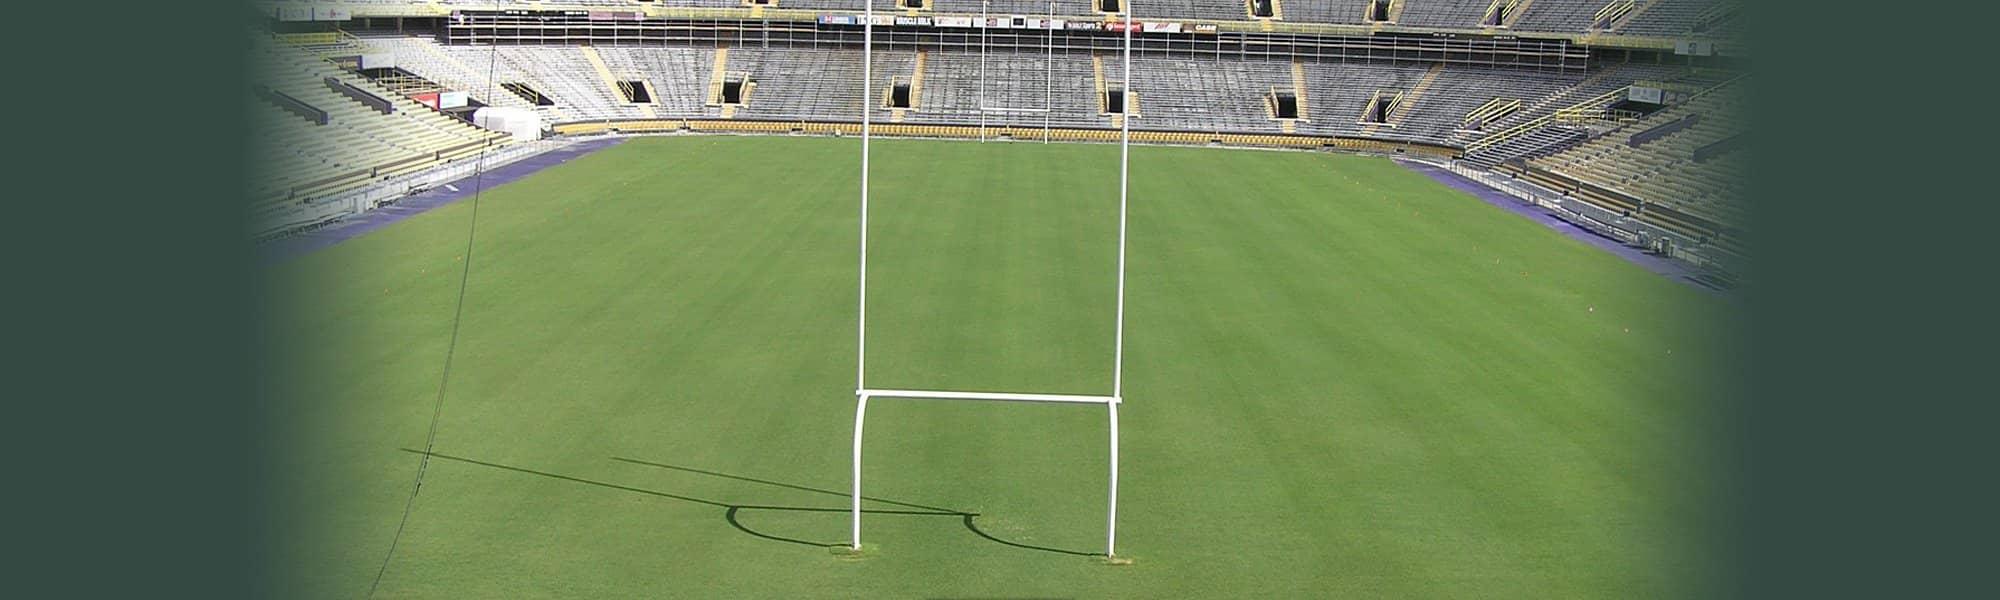 Grounds Maintenance Sports Field Turf Management